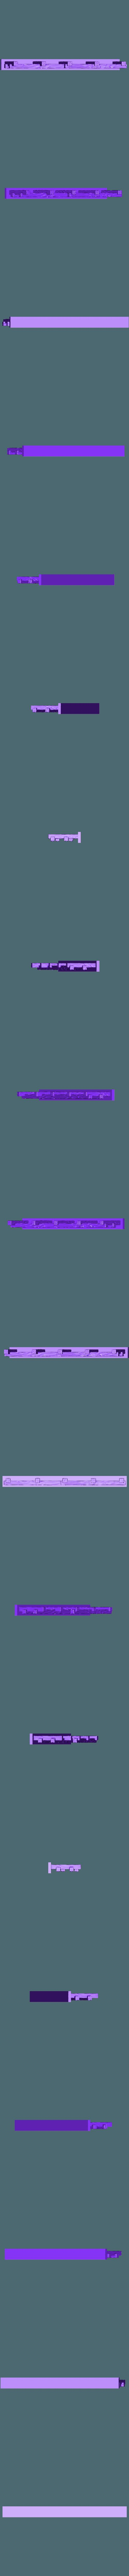 fence_1.stl Download free STL file Fence miniatures • 3D printing model, Ilhadiel